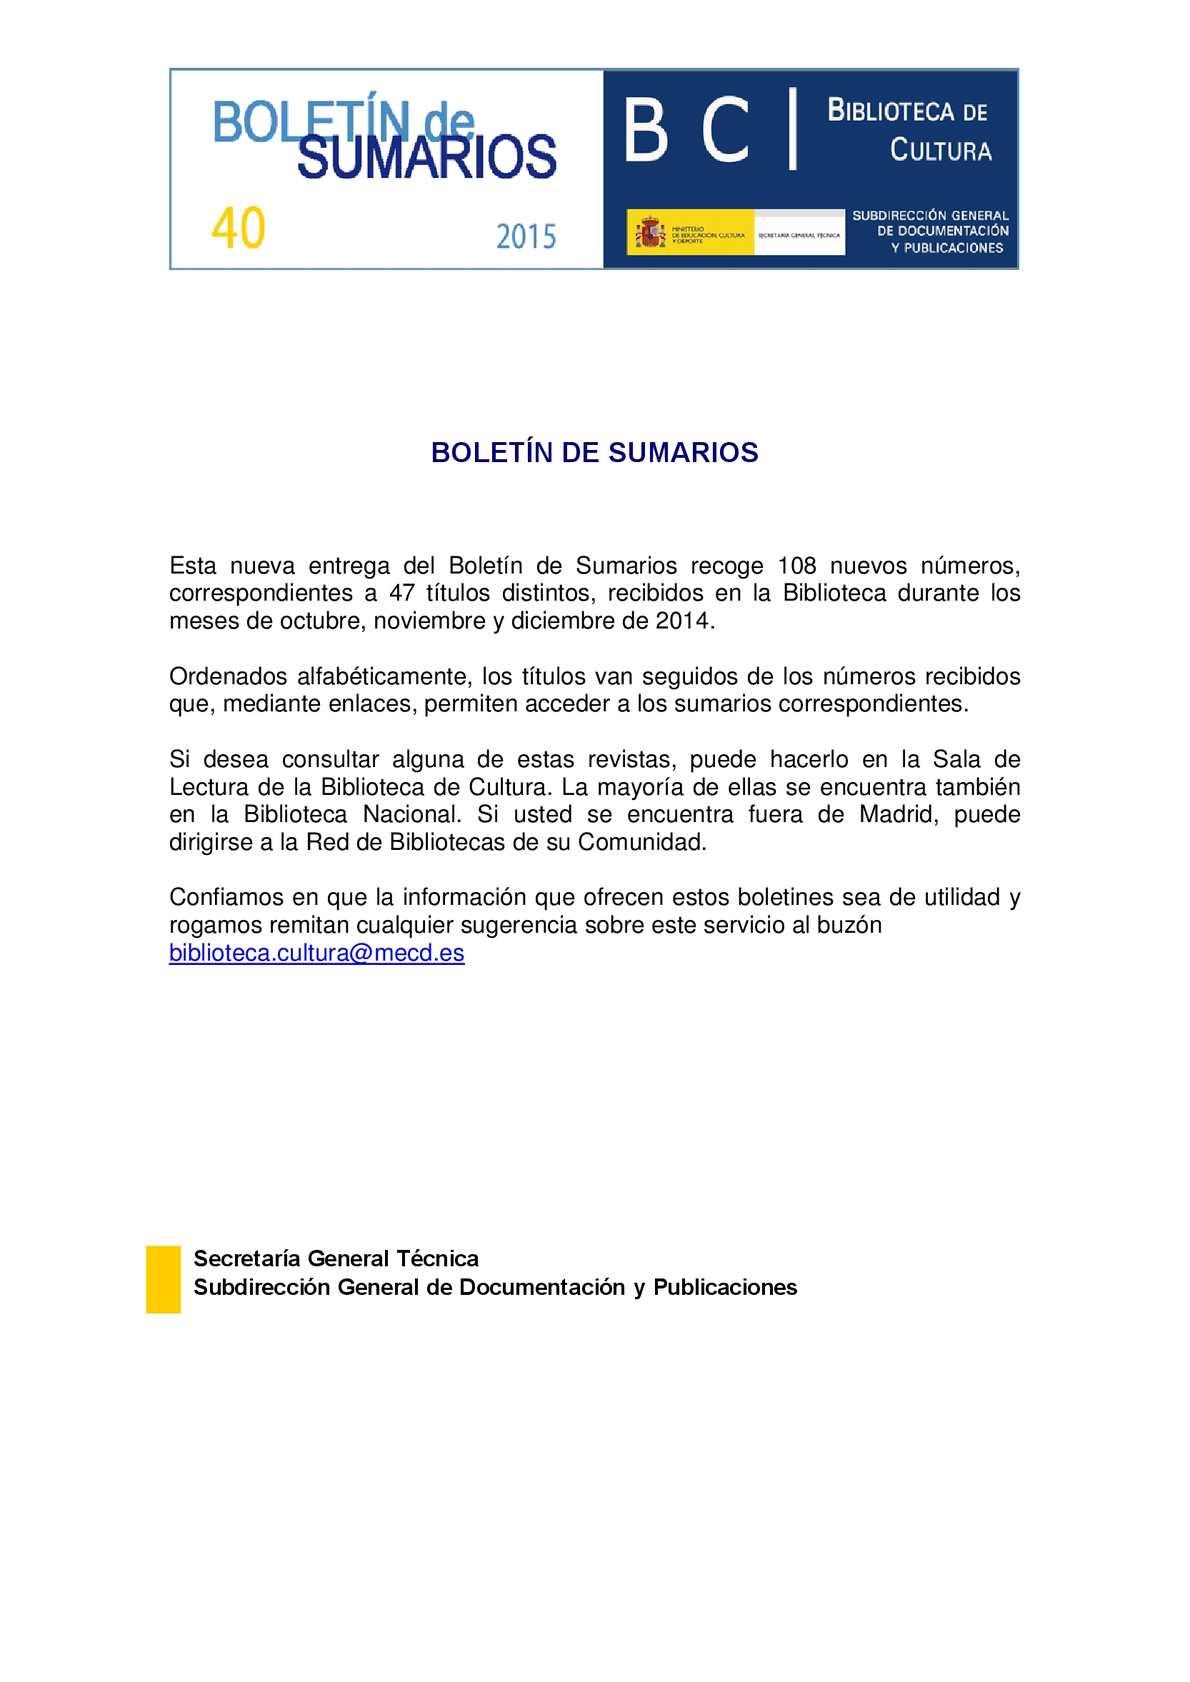 Calaméo Boletín De Sumarios Nº 40 De La Biblioteca De Cultura